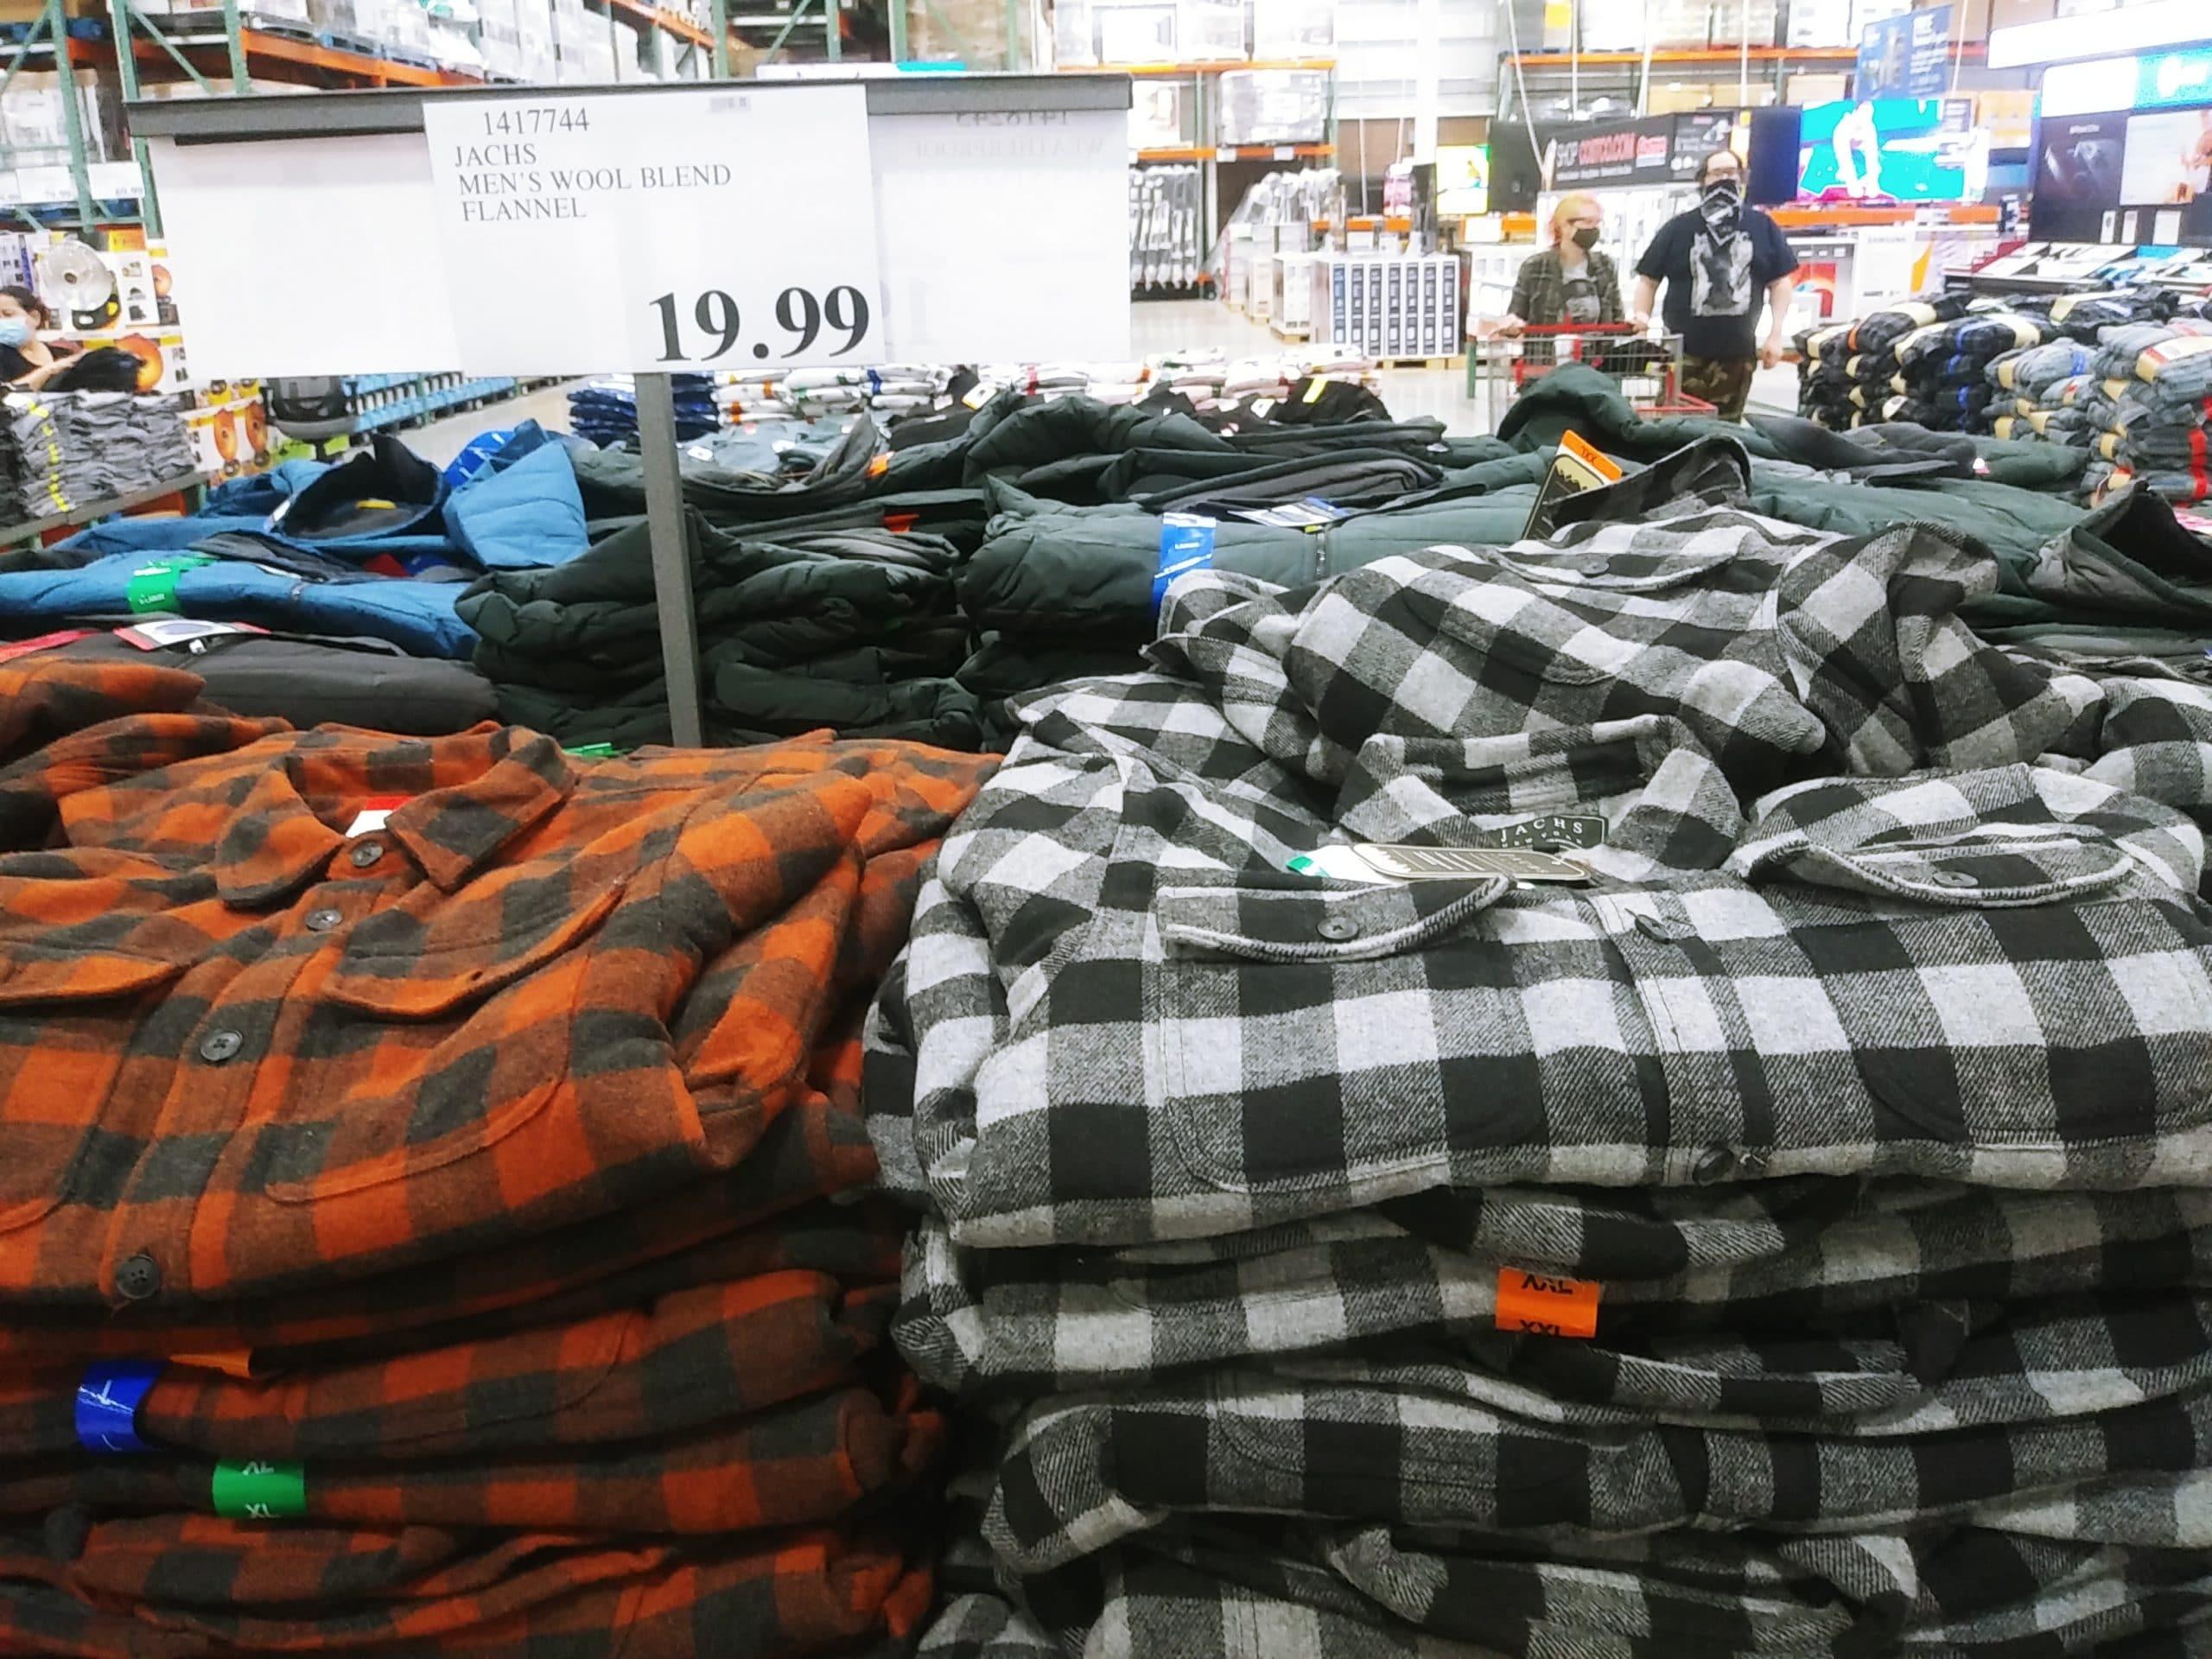 Jachs Mens Wool Blend Flannel $19.99